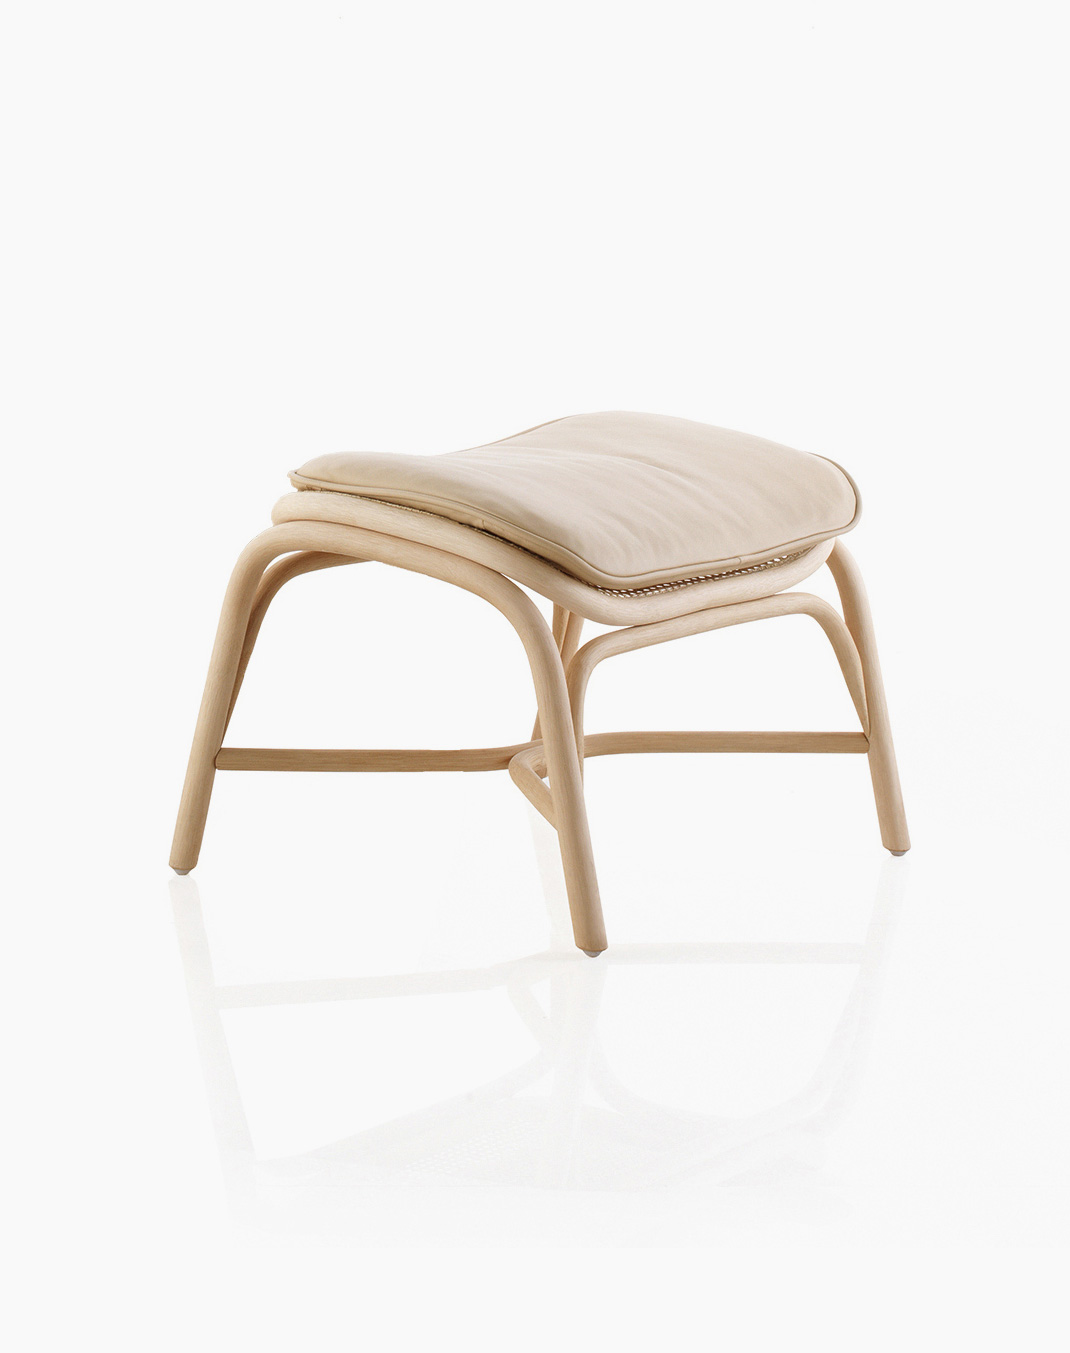 TinnappleMetz-Expormim-Frames-footstool-04